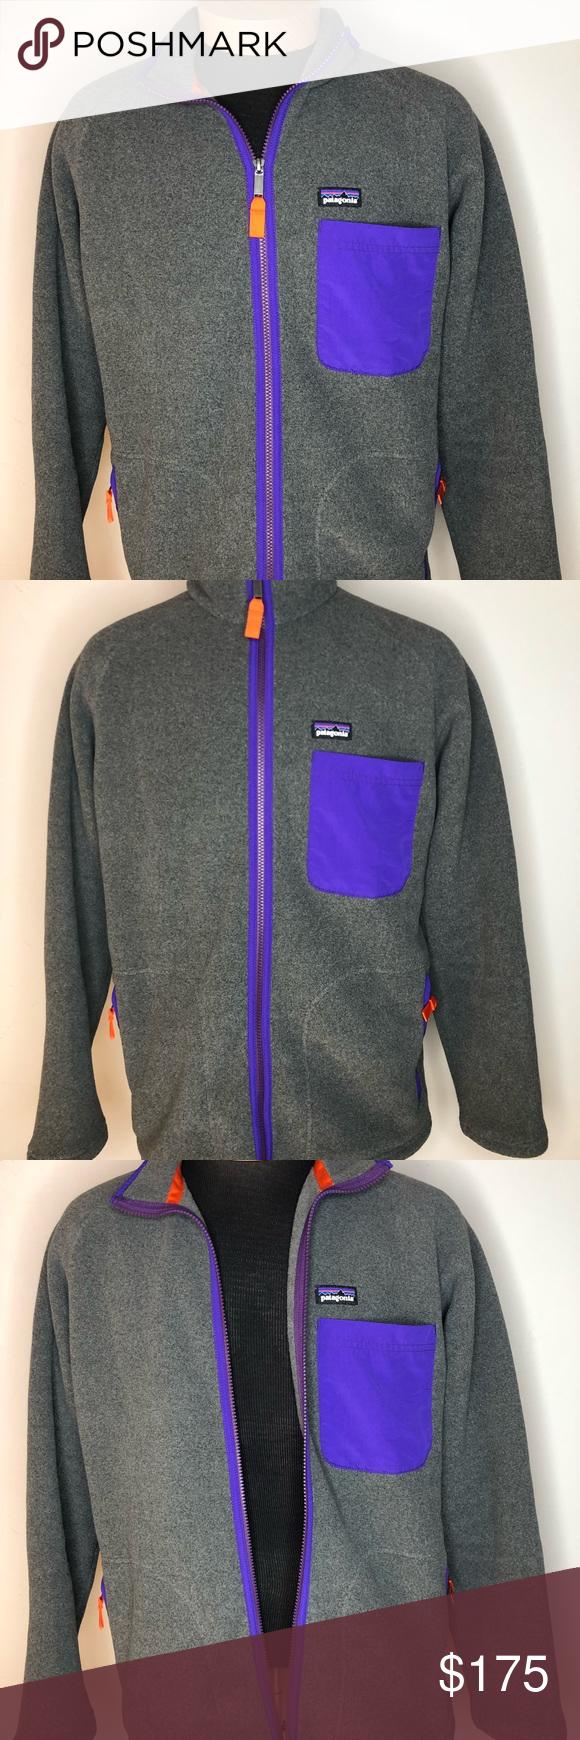 Patagonia jacket vtg s grey purple zip medium my posh closet